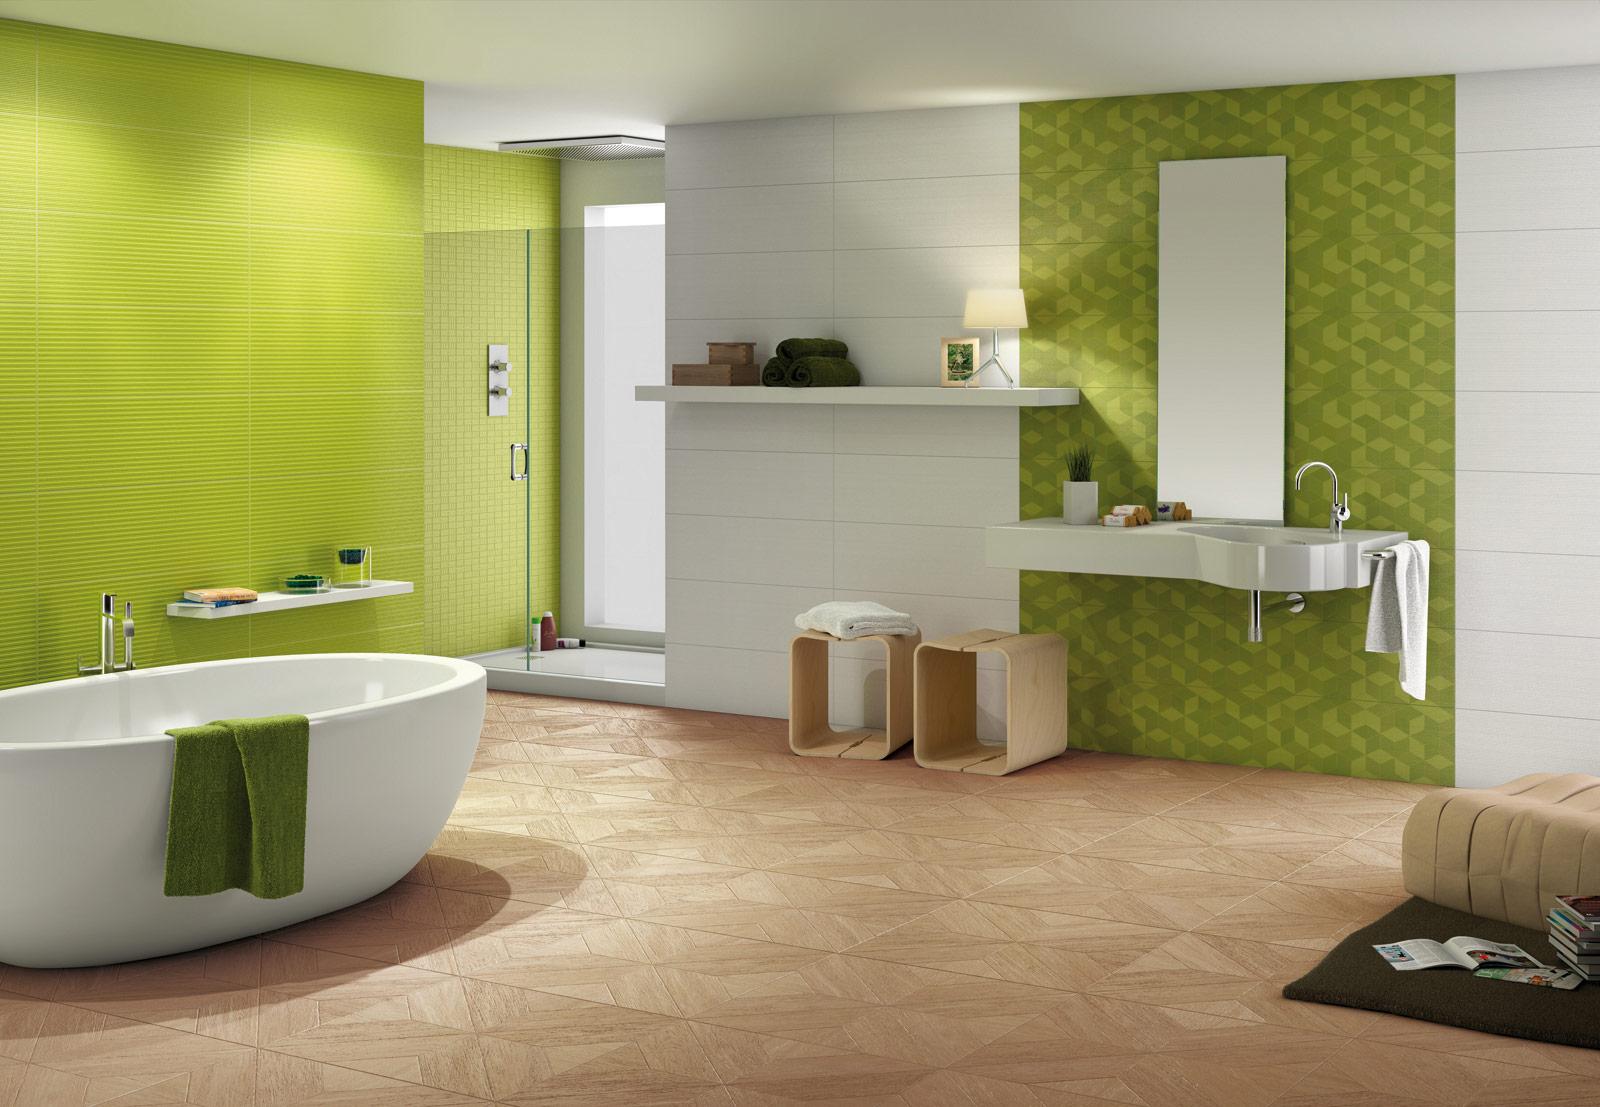 Verano gres porcel nico revestimiento ba os spa marazzi - Piastrelle colorate per bagno ...